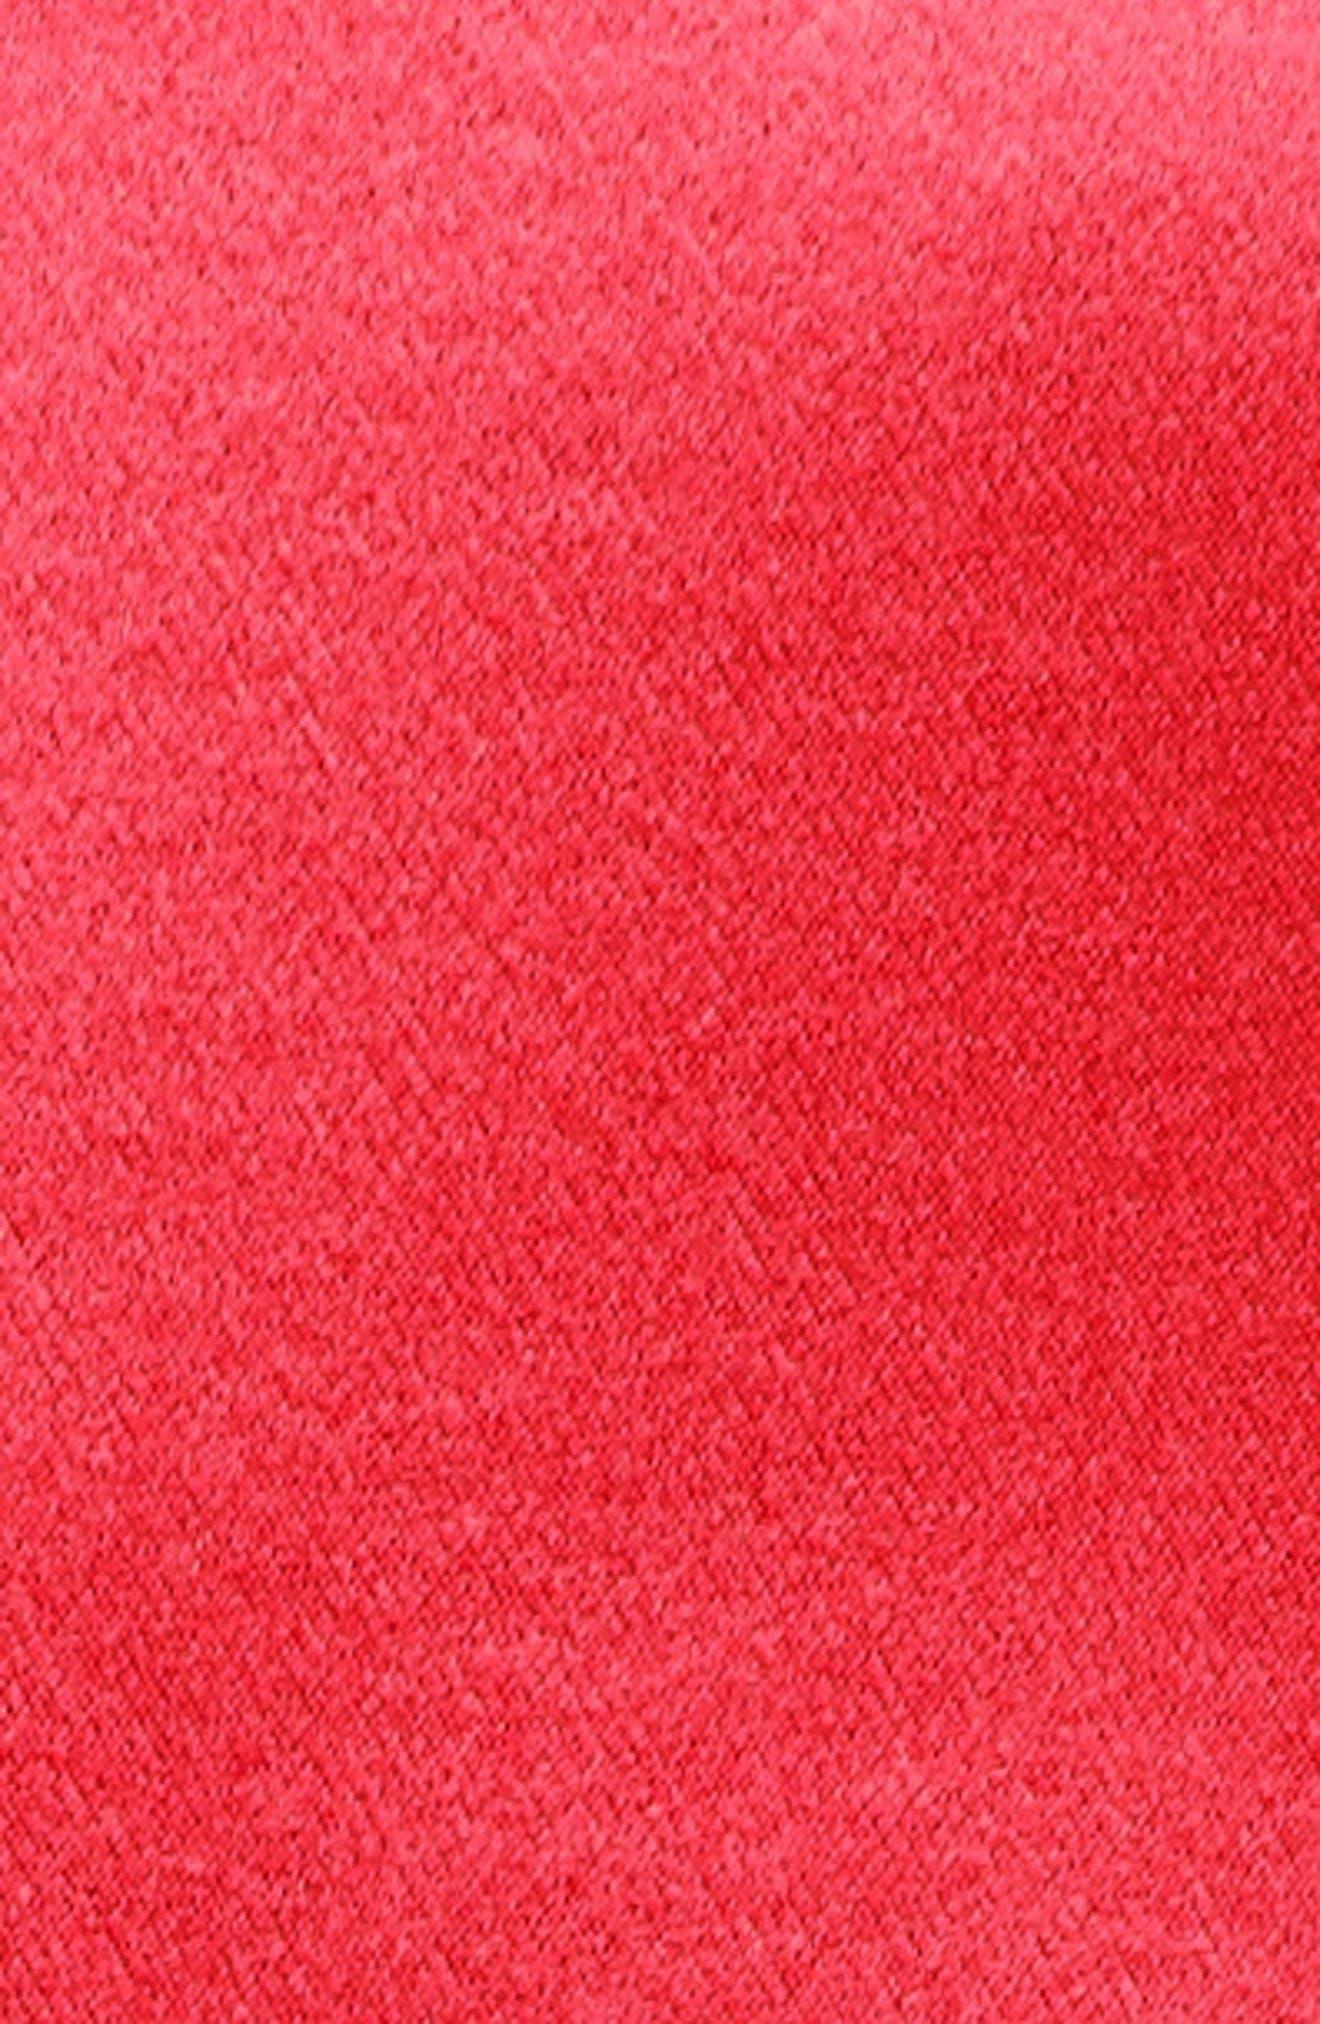 Alternate Image 3  - Carolina Herrera Silk Satin Gown (Nordstrom Exclusive)